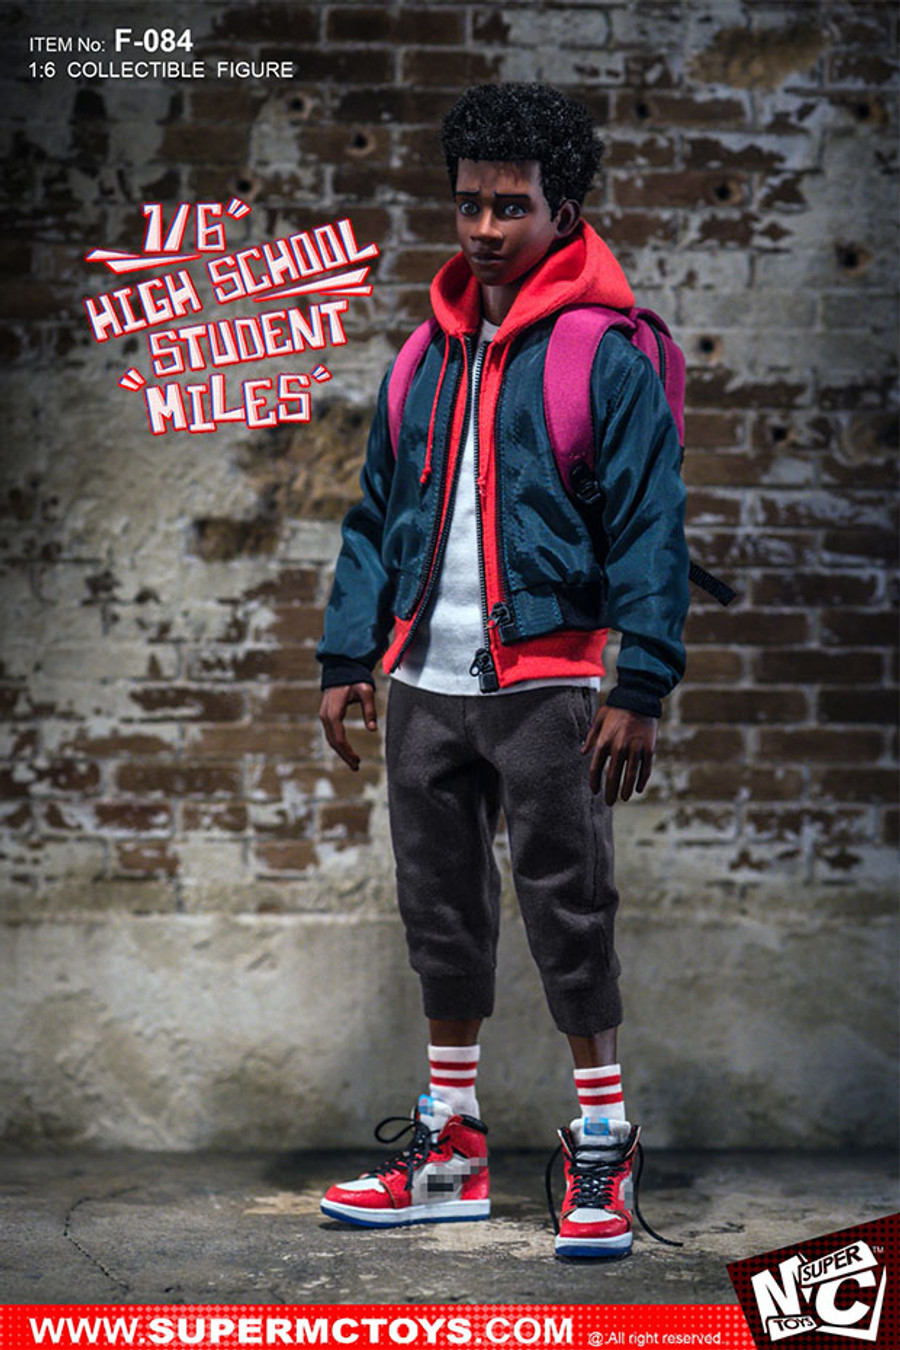 Super MC Toys - High School Student Miles Action Figure